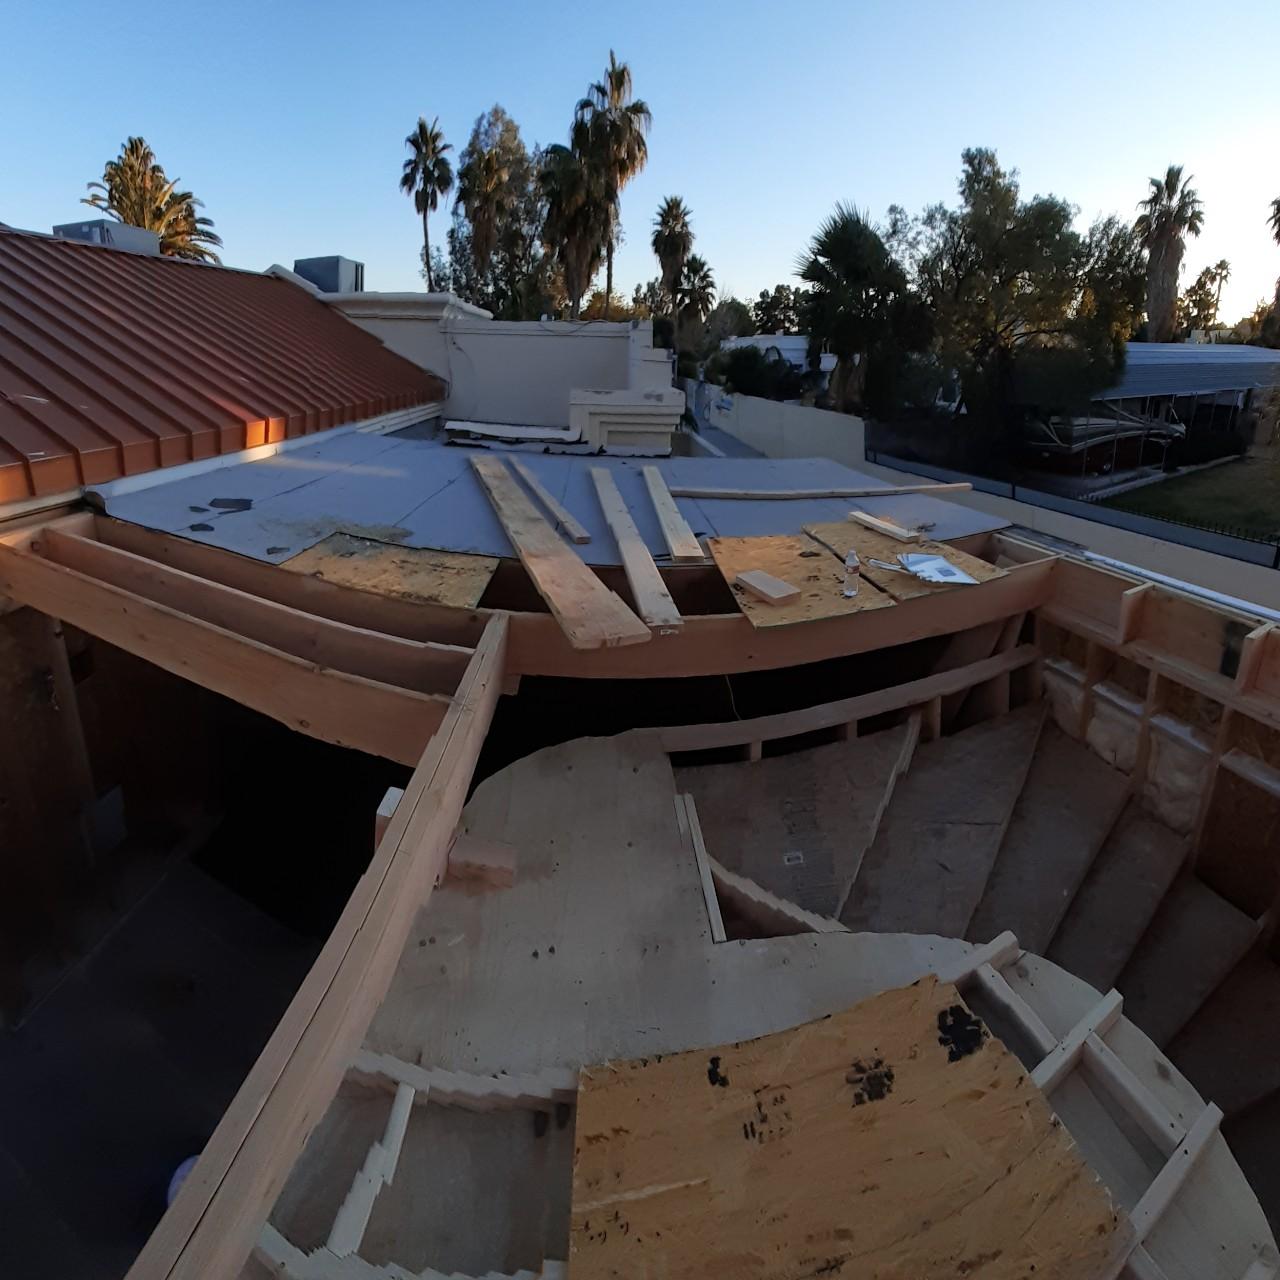 carpentry-wood-framing-second-floor-home-addition--framing-55